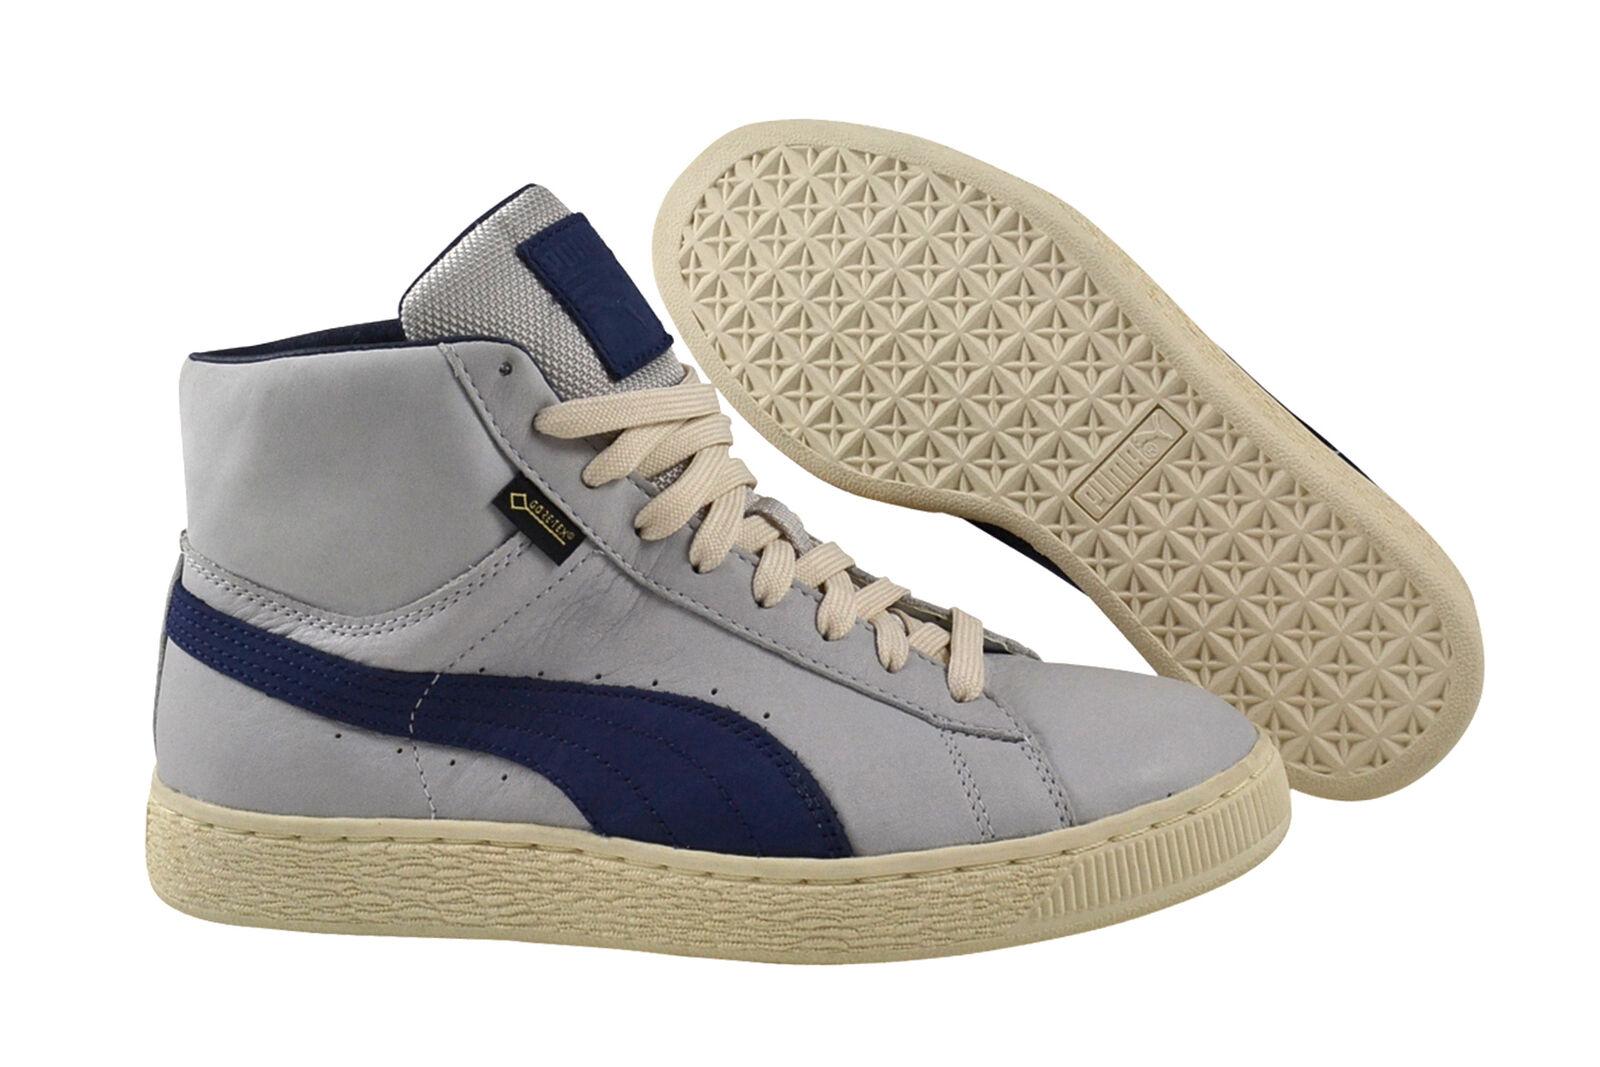 Puma Basket MID GTX glacier gray/peacoat Sneaker/Schuhe grau 361900 01